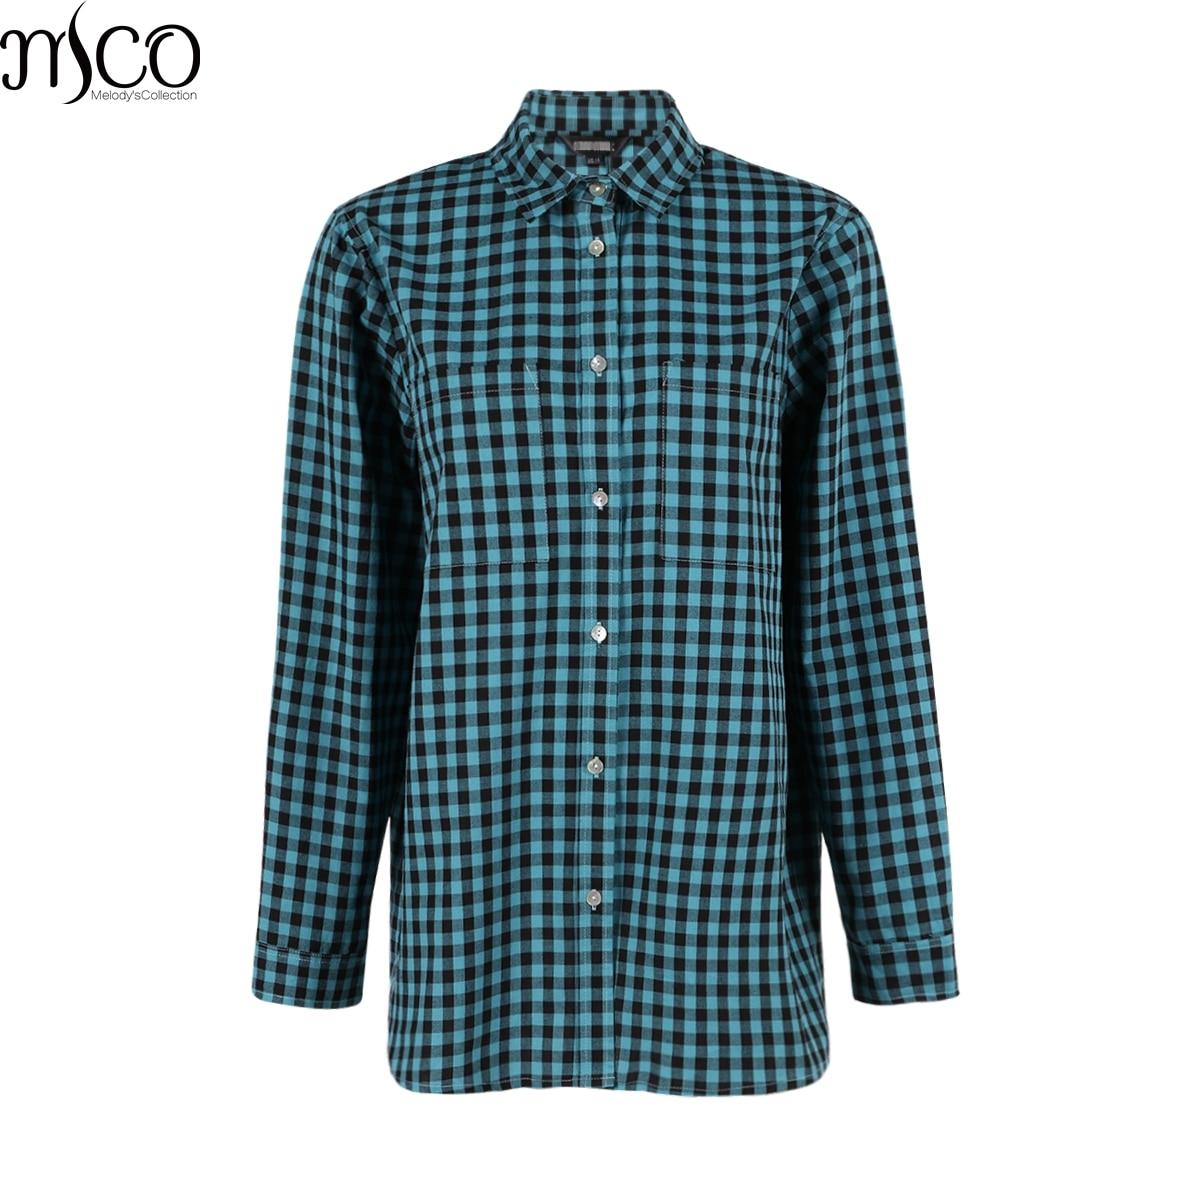 MCO Autumn Basic Plus Size Check Top For Office Ladies Simple Oversized Women Blouse Classic Plaid Shirt Big Size 5xl 6xl 7xl